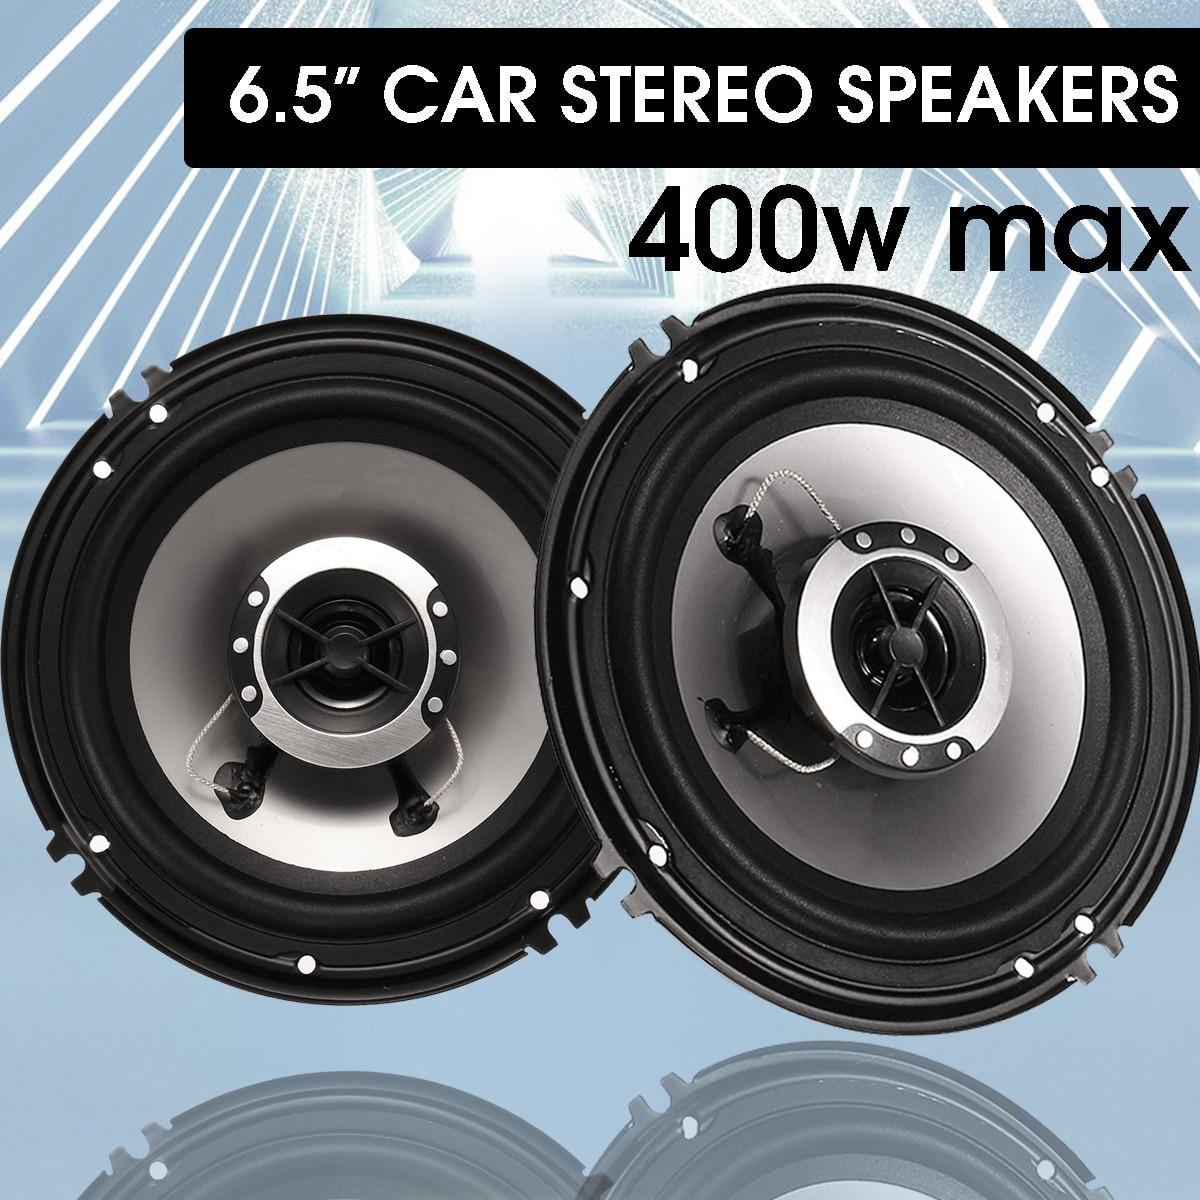 2 pçs 6.5 Polegada 400 w alto-falante de áudio do carro 4 vias coaxial alto falante universal veículo auto áudio música estéreo alta fidelidade altifalante